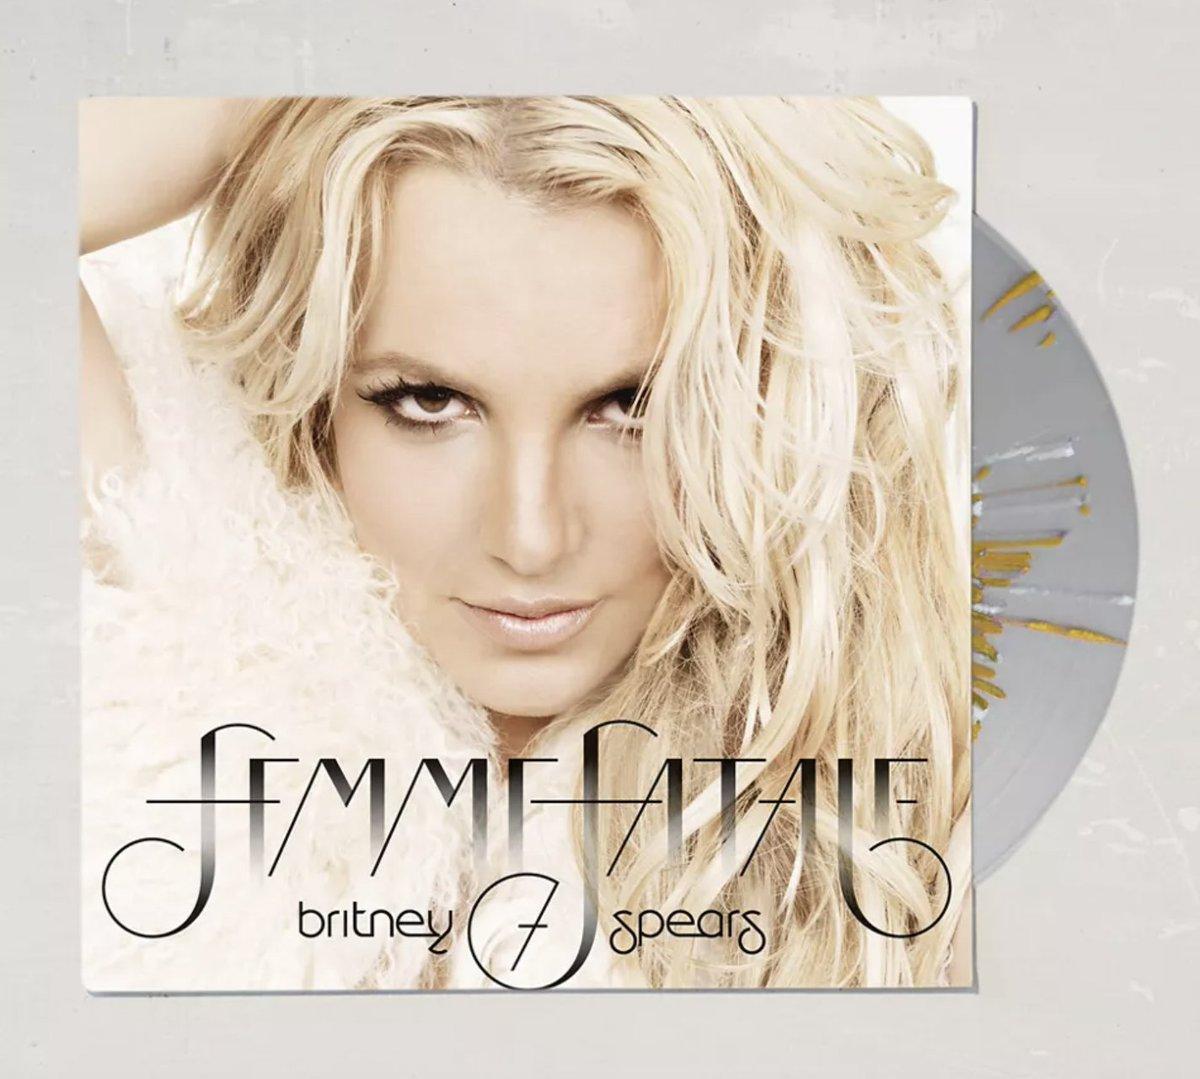 surprise 😉  @britneyspears Femme Fatale is available for preorder on splattered vinyl: